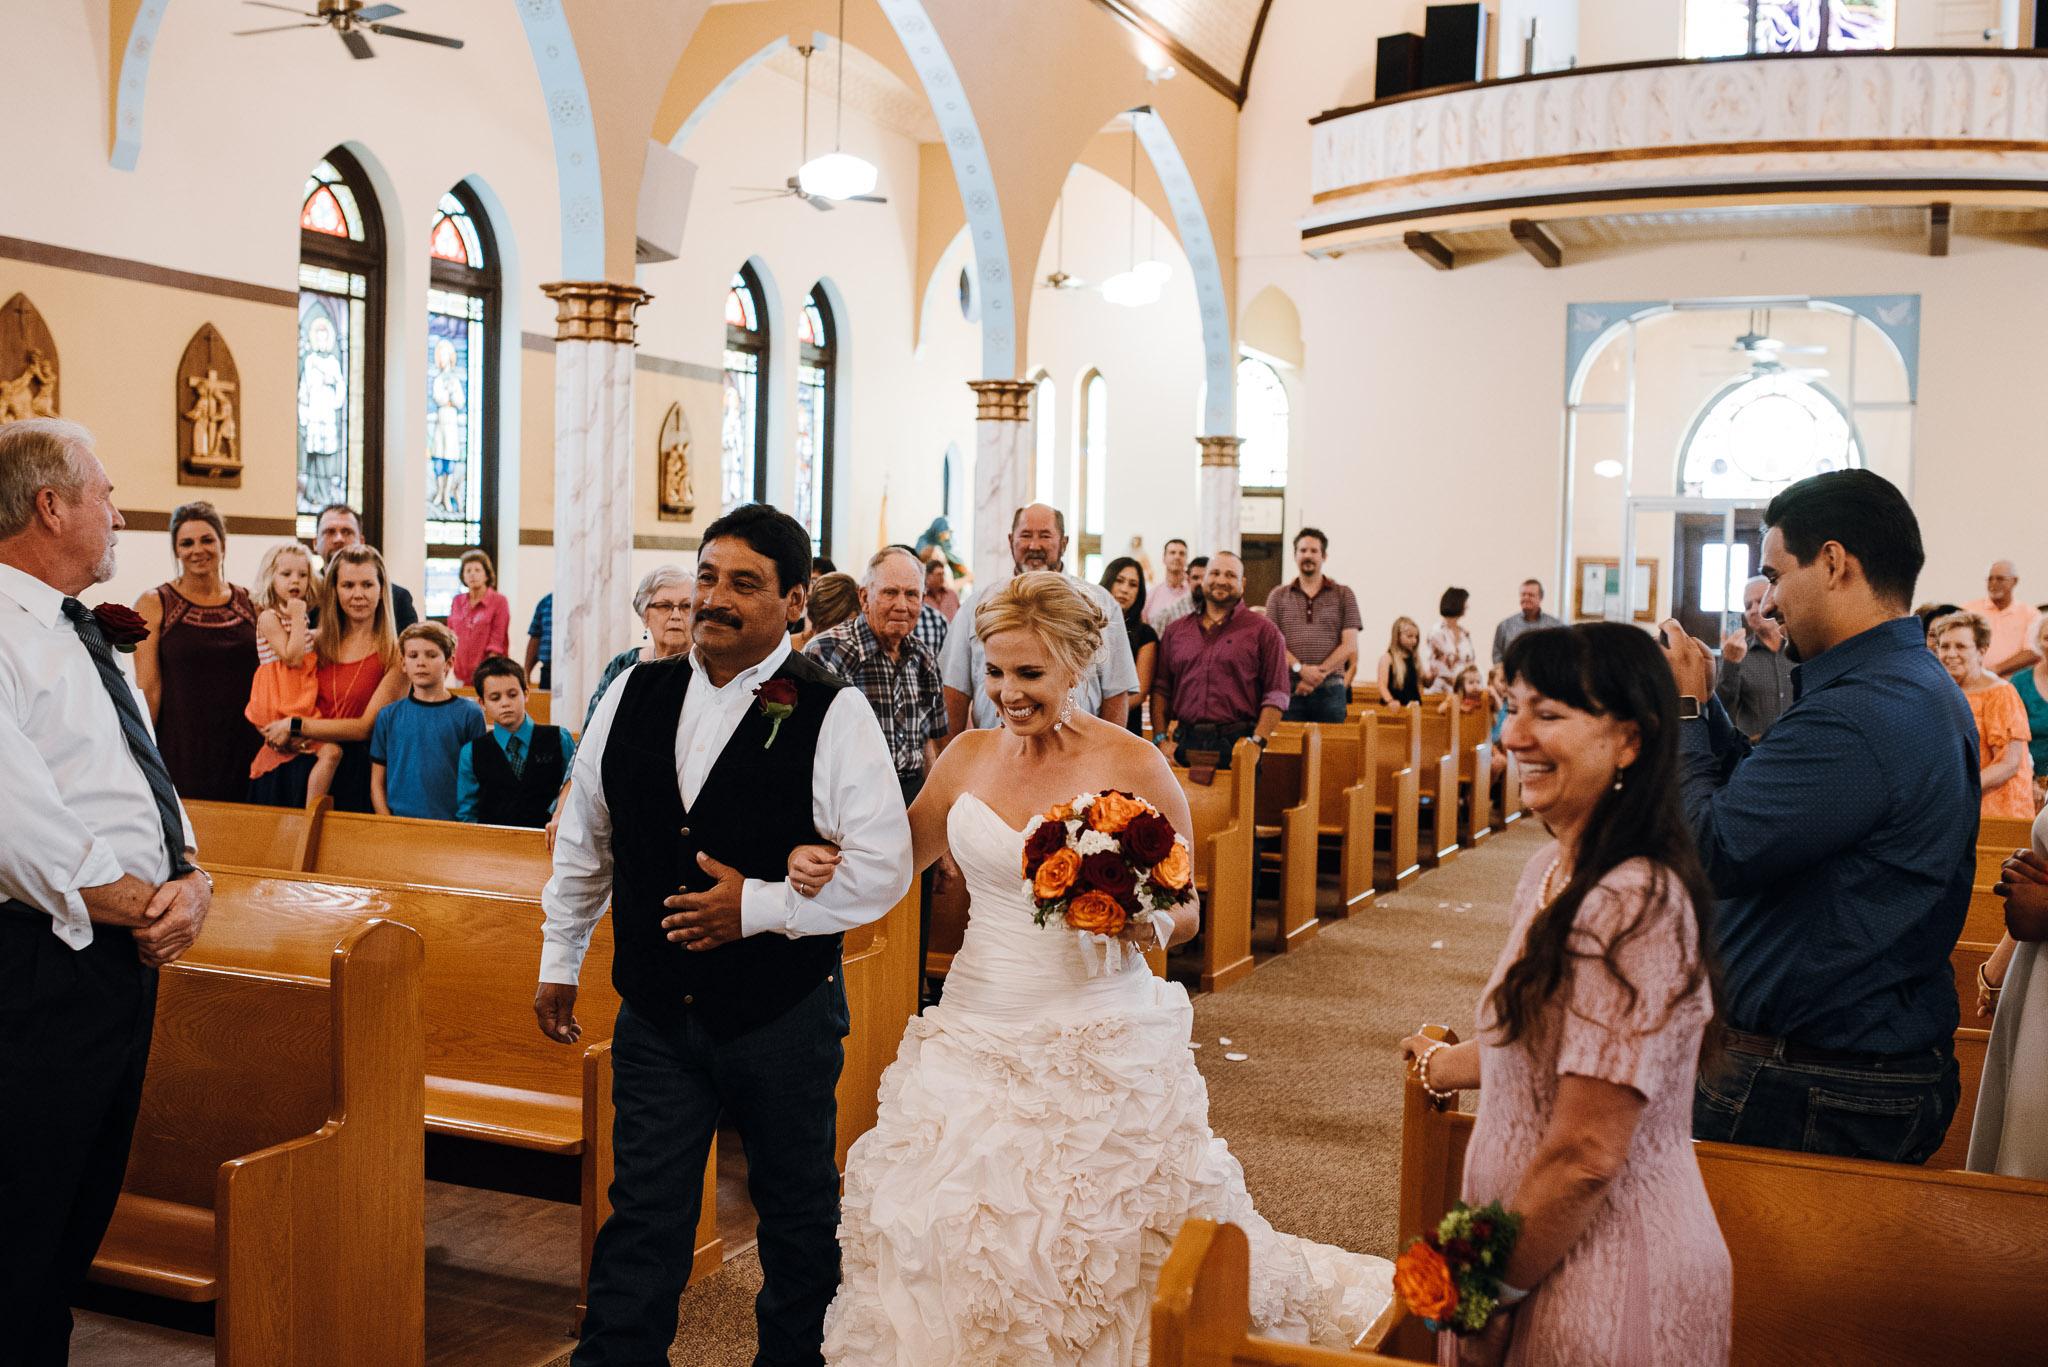 Rowena-West-Texas-Wedding-Photographer-Gillian&Ryan-0020.jpg